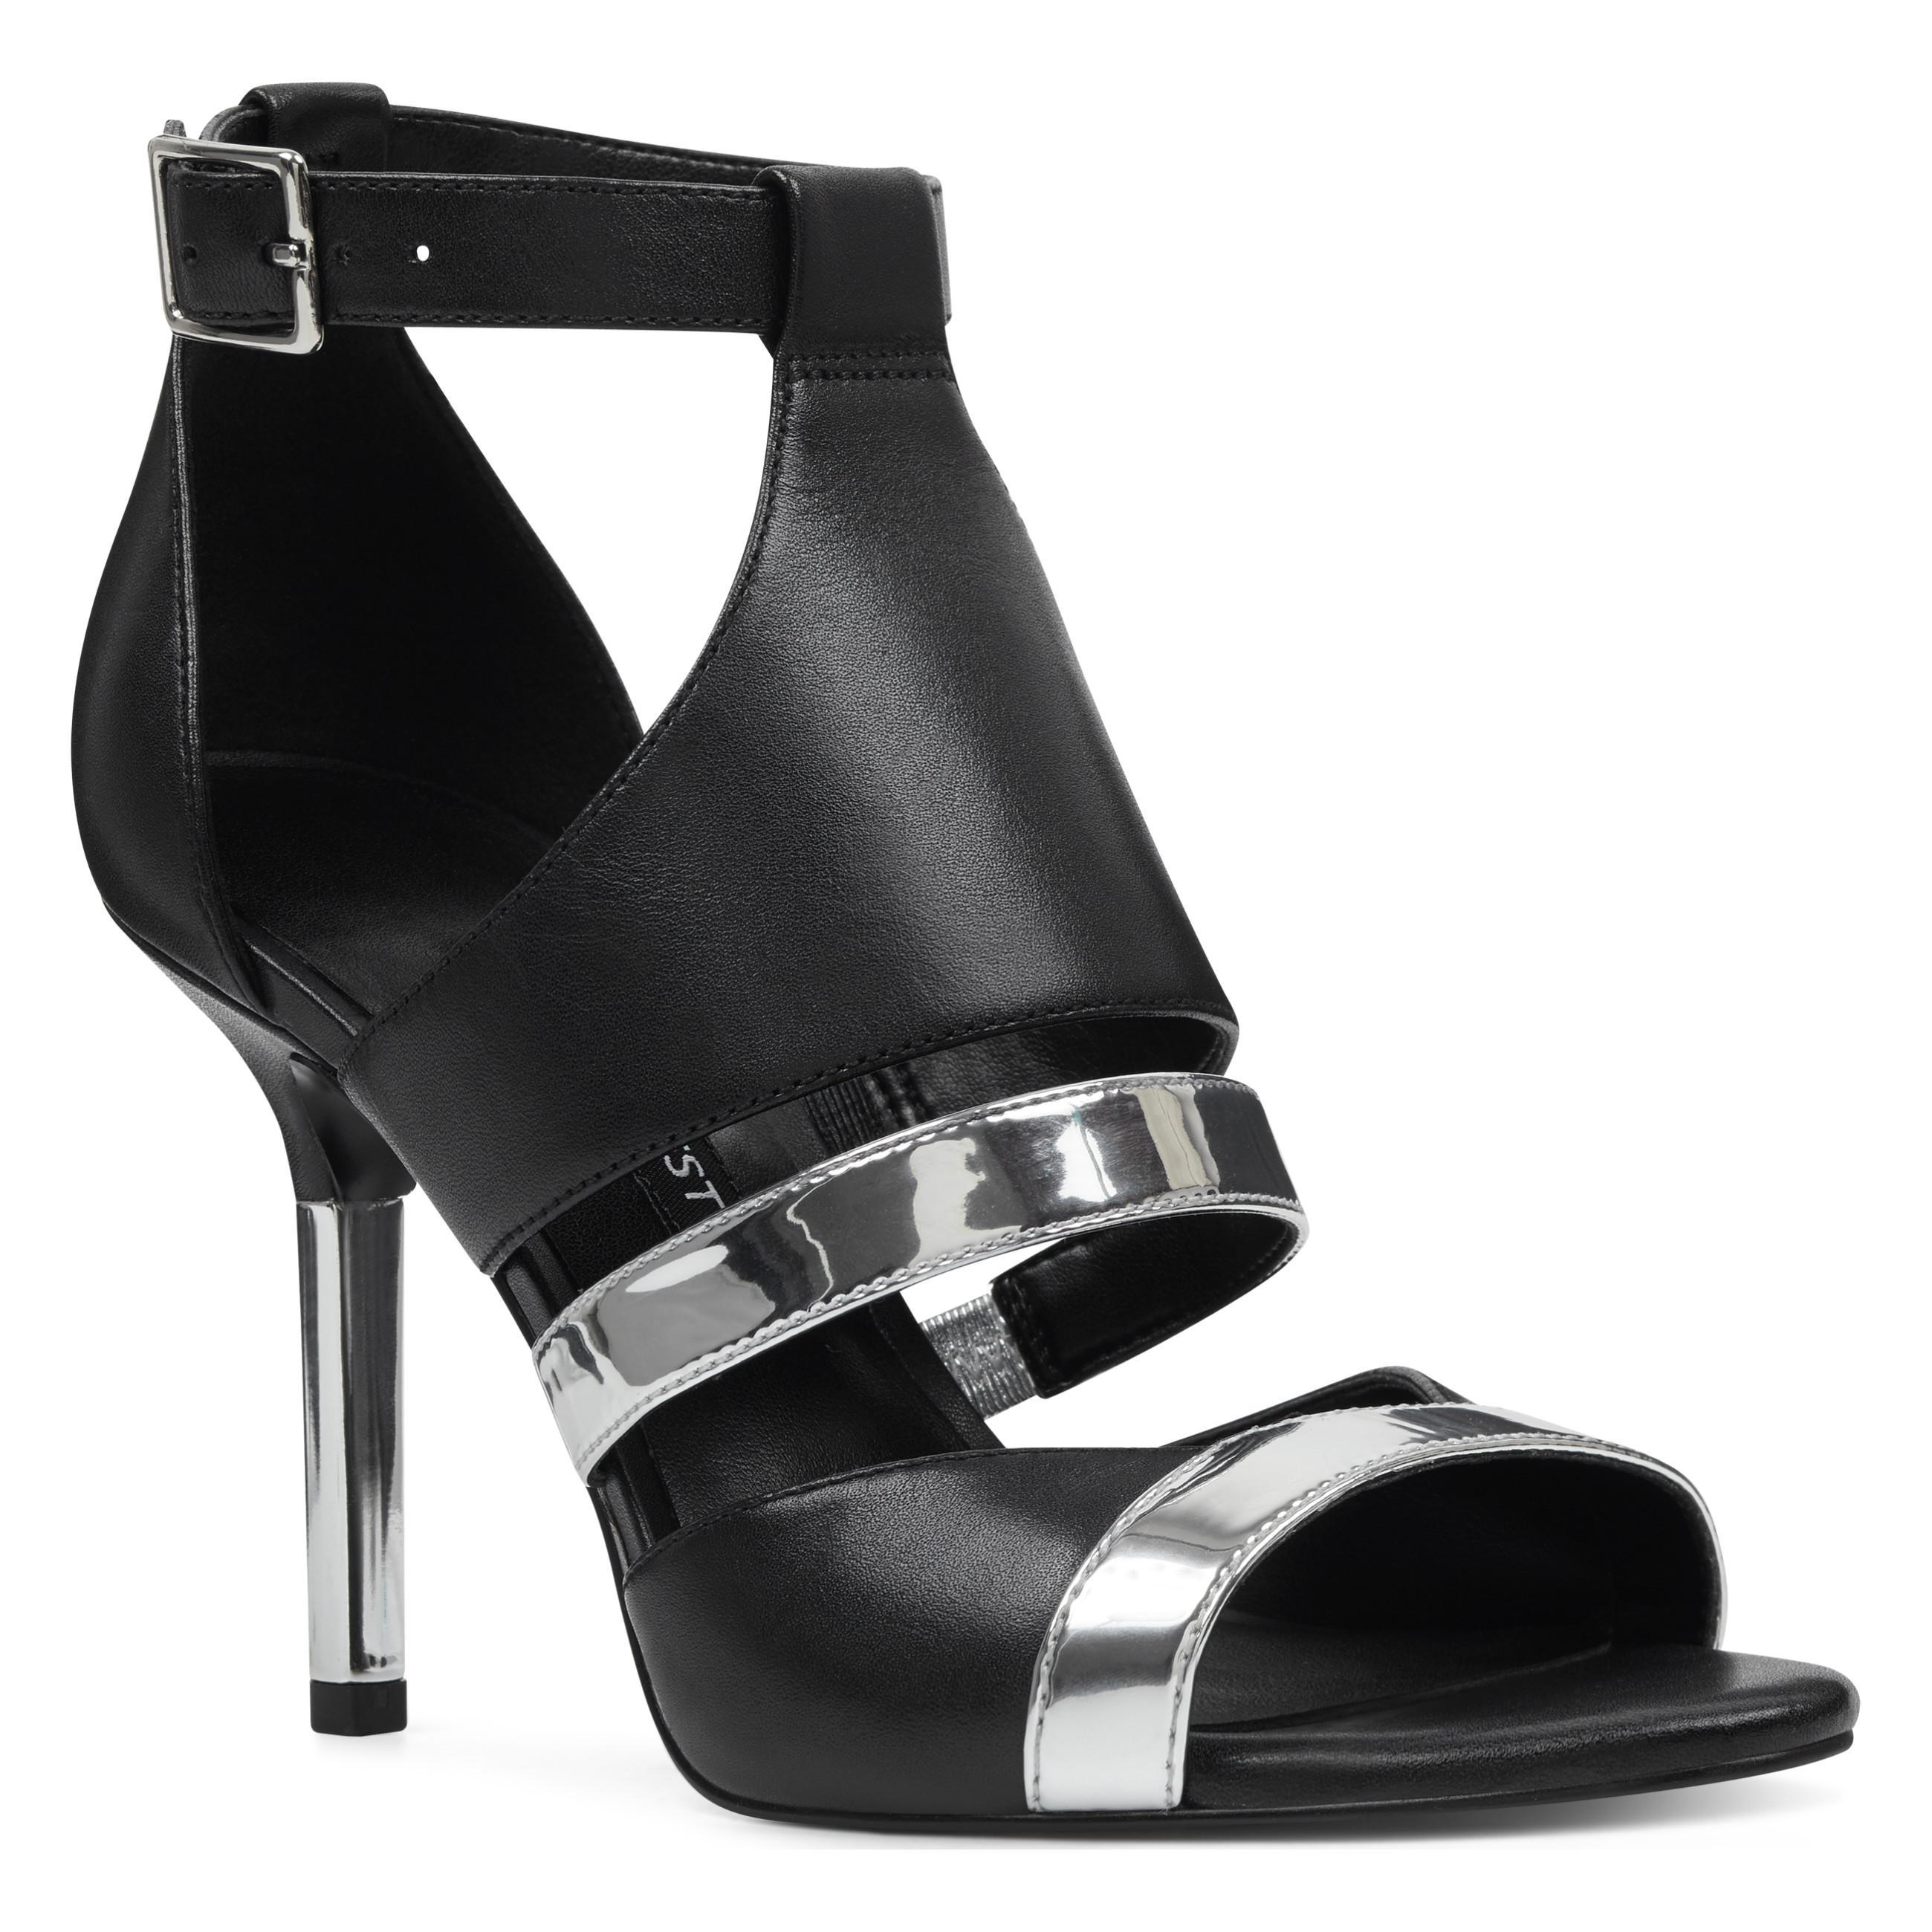 9e6361c64a8093 Nine West - Black Brianna Caged Sandals - Lyst. View fullscreen